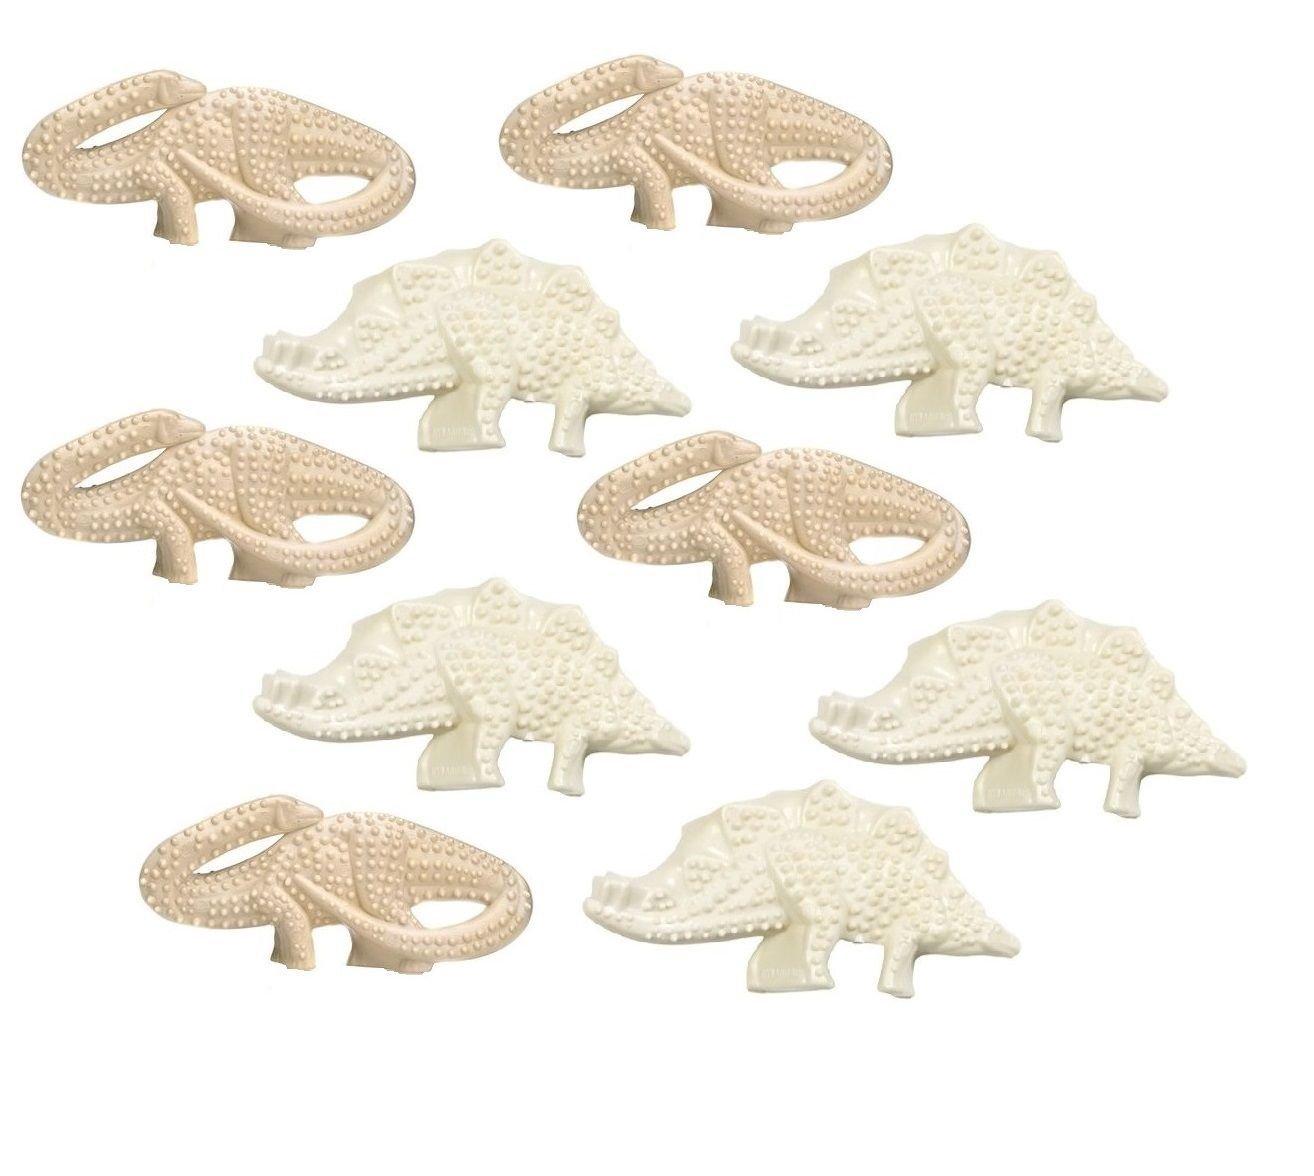 Durable Dental Dinosaur Textured Dog Chew Toy Stagosaurus Brontosaurus SET OF 2 (Five Two Packs)